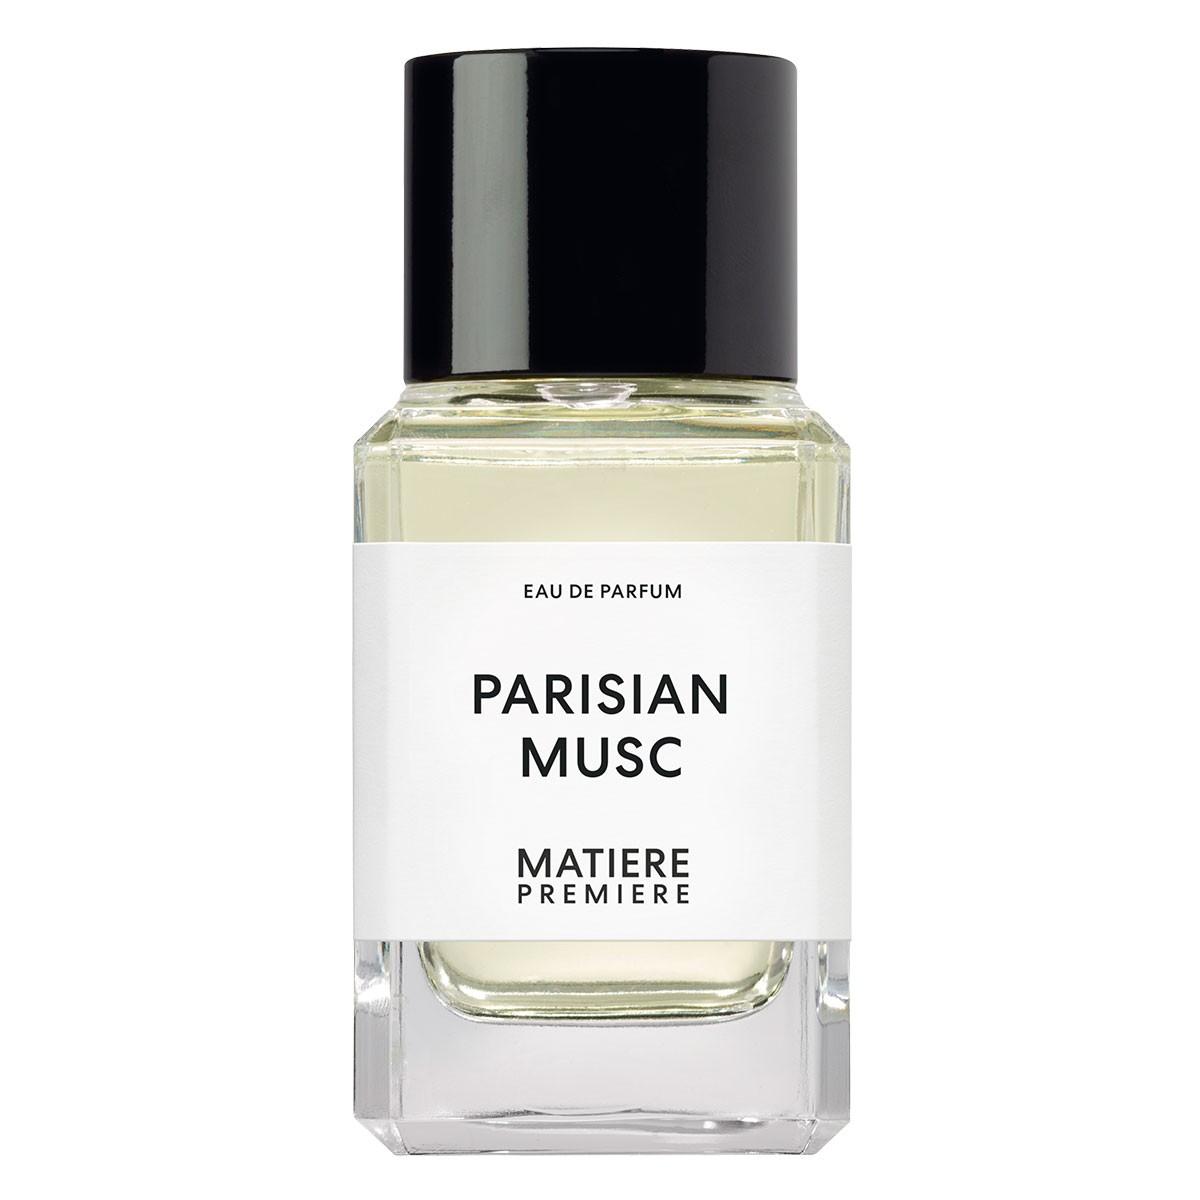 Matiere Premiere Parisian Musc 100ml - Perfume